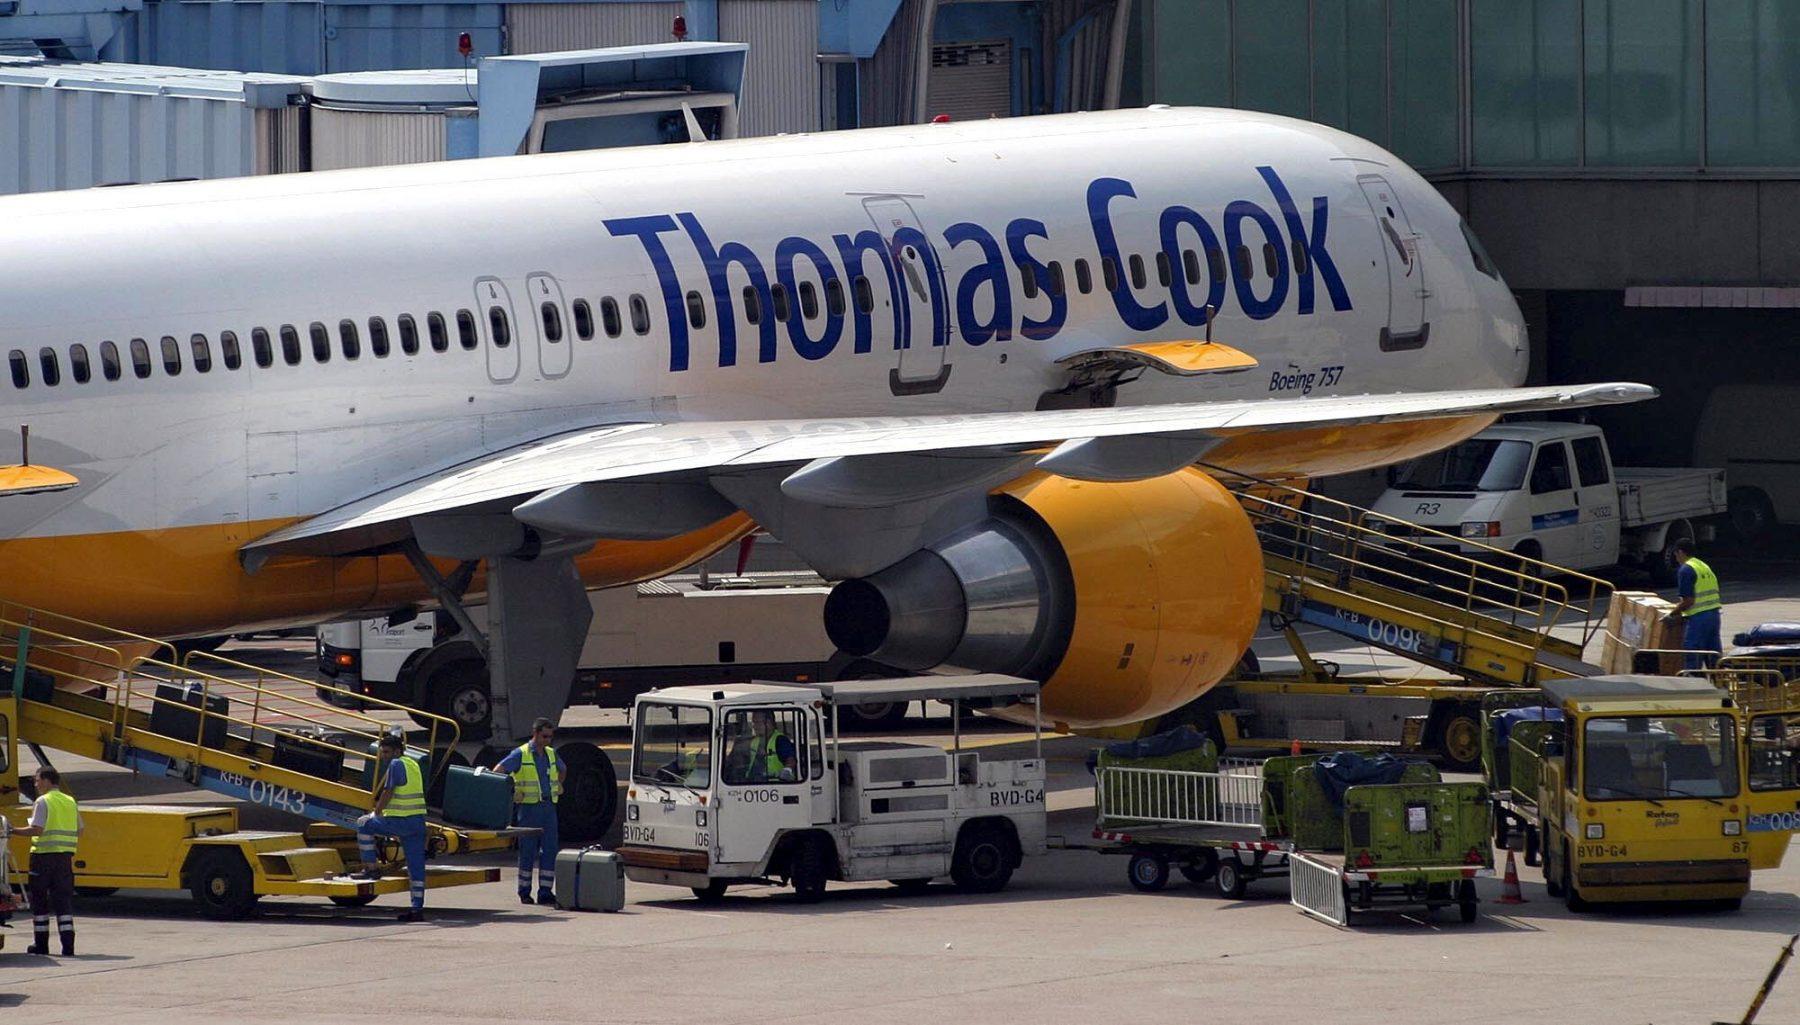 Thomas Cook maakt nogal 'lullig foutje' met vliegtuigbedrukking